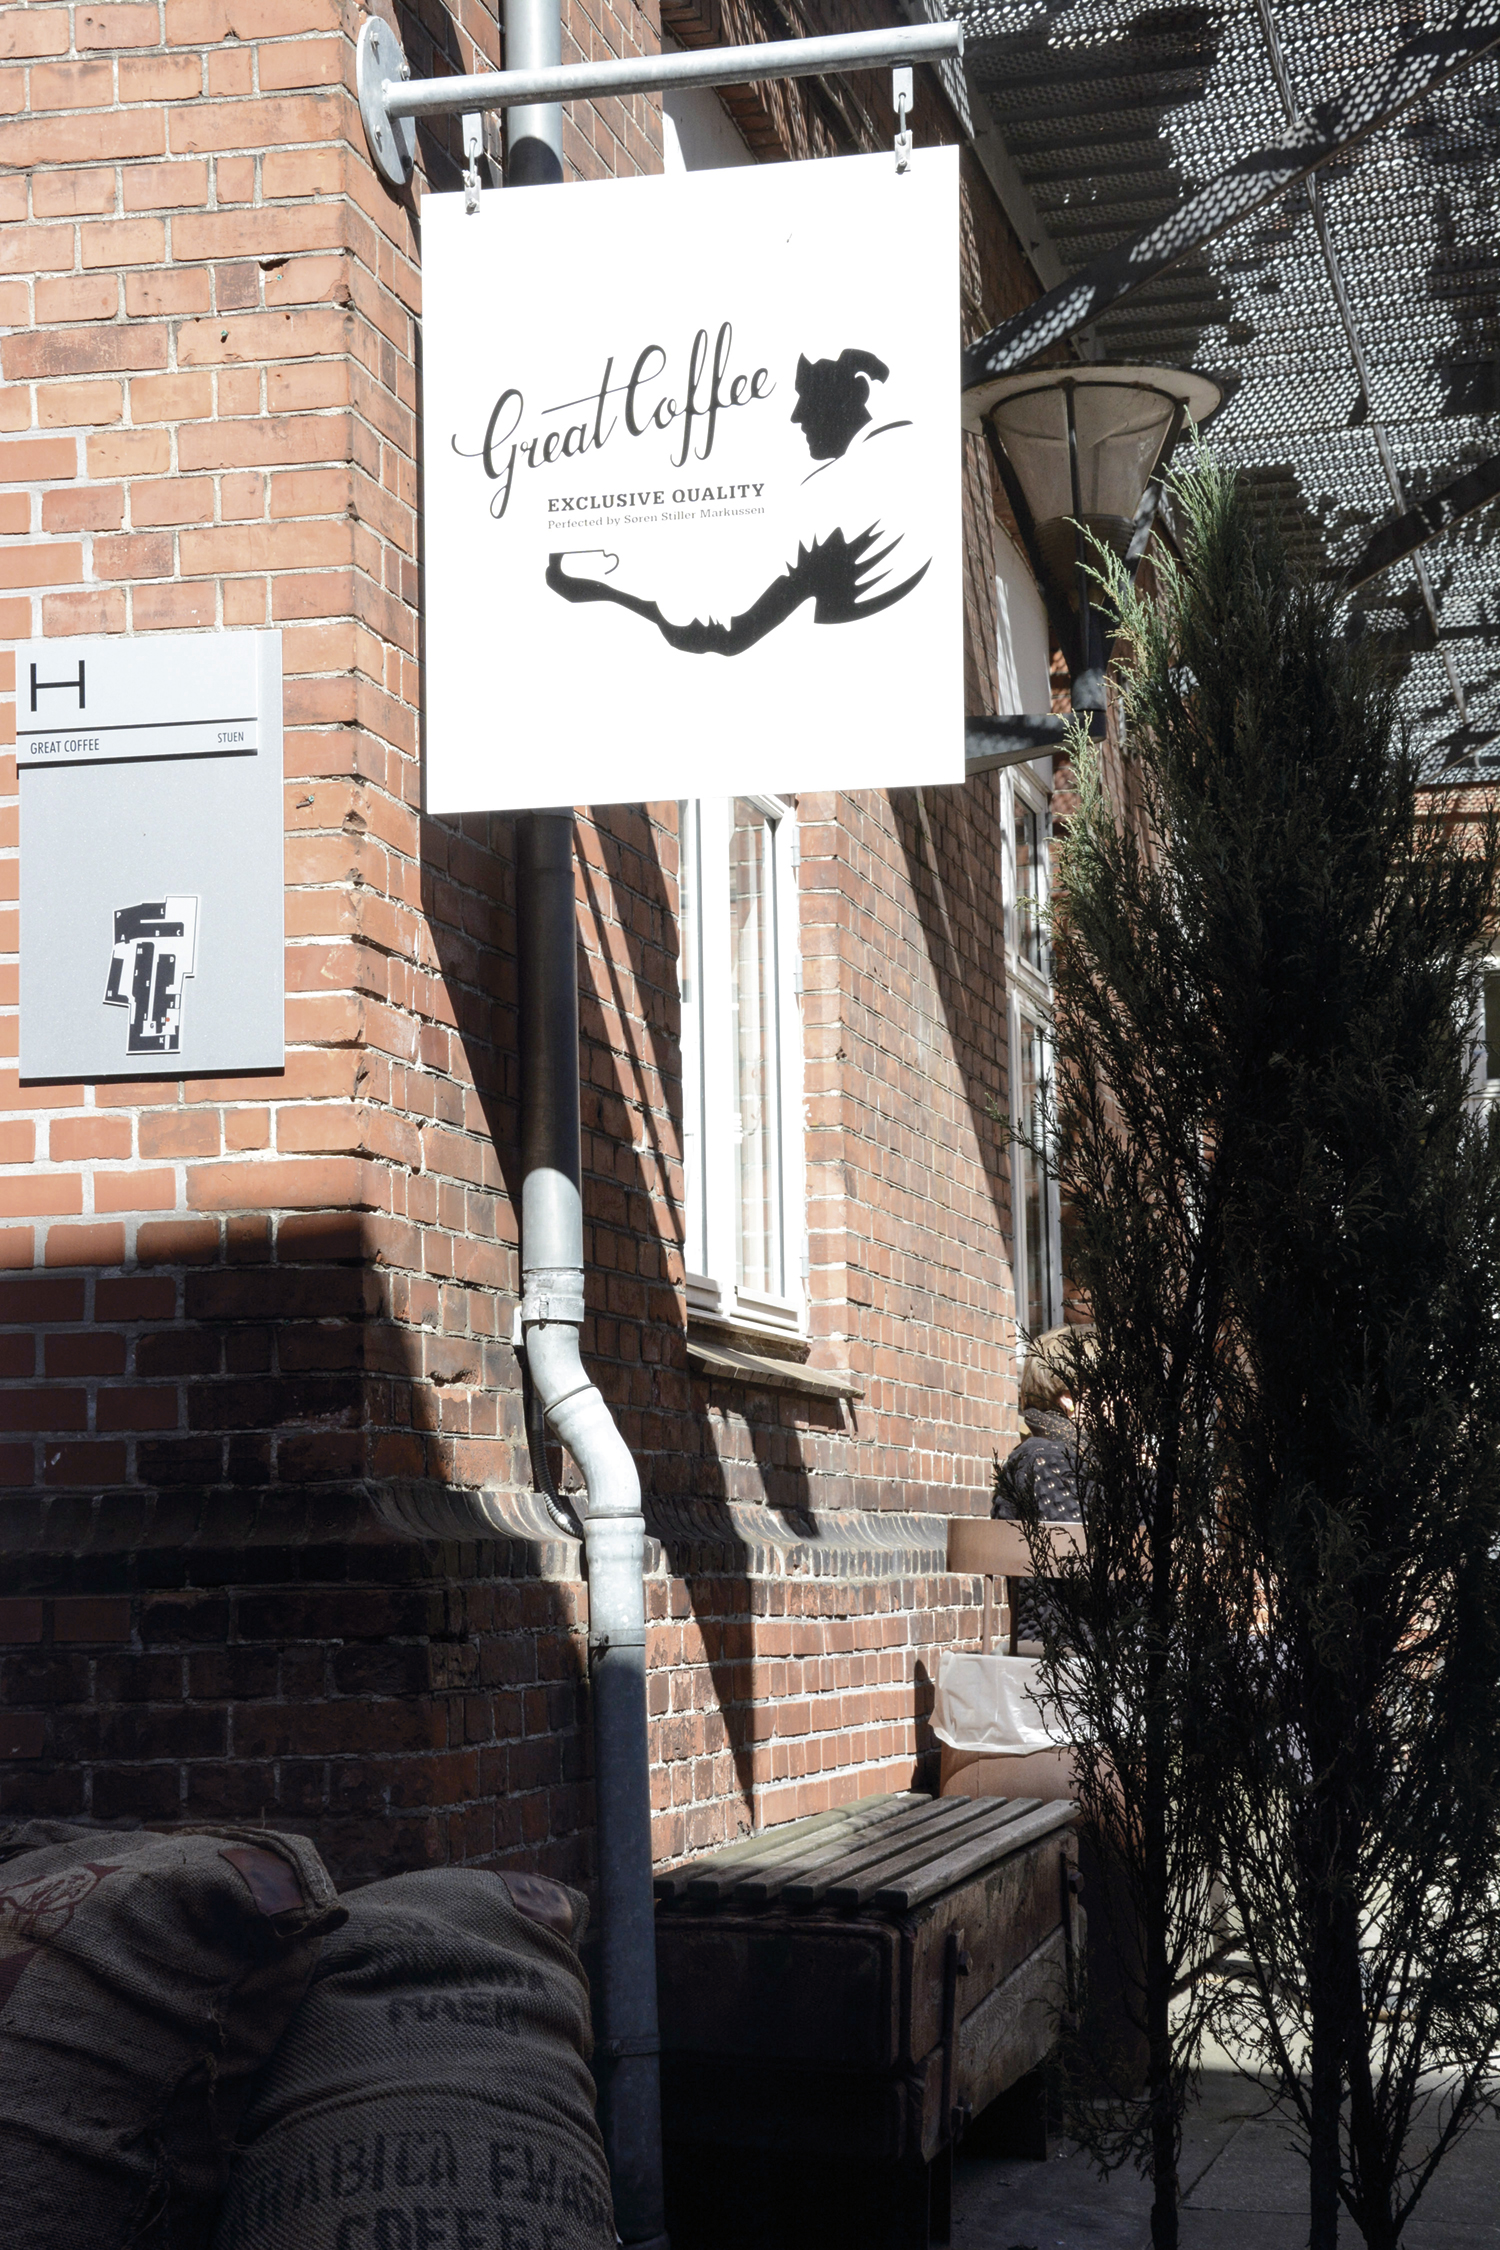 Great-Coffee-5.jpg